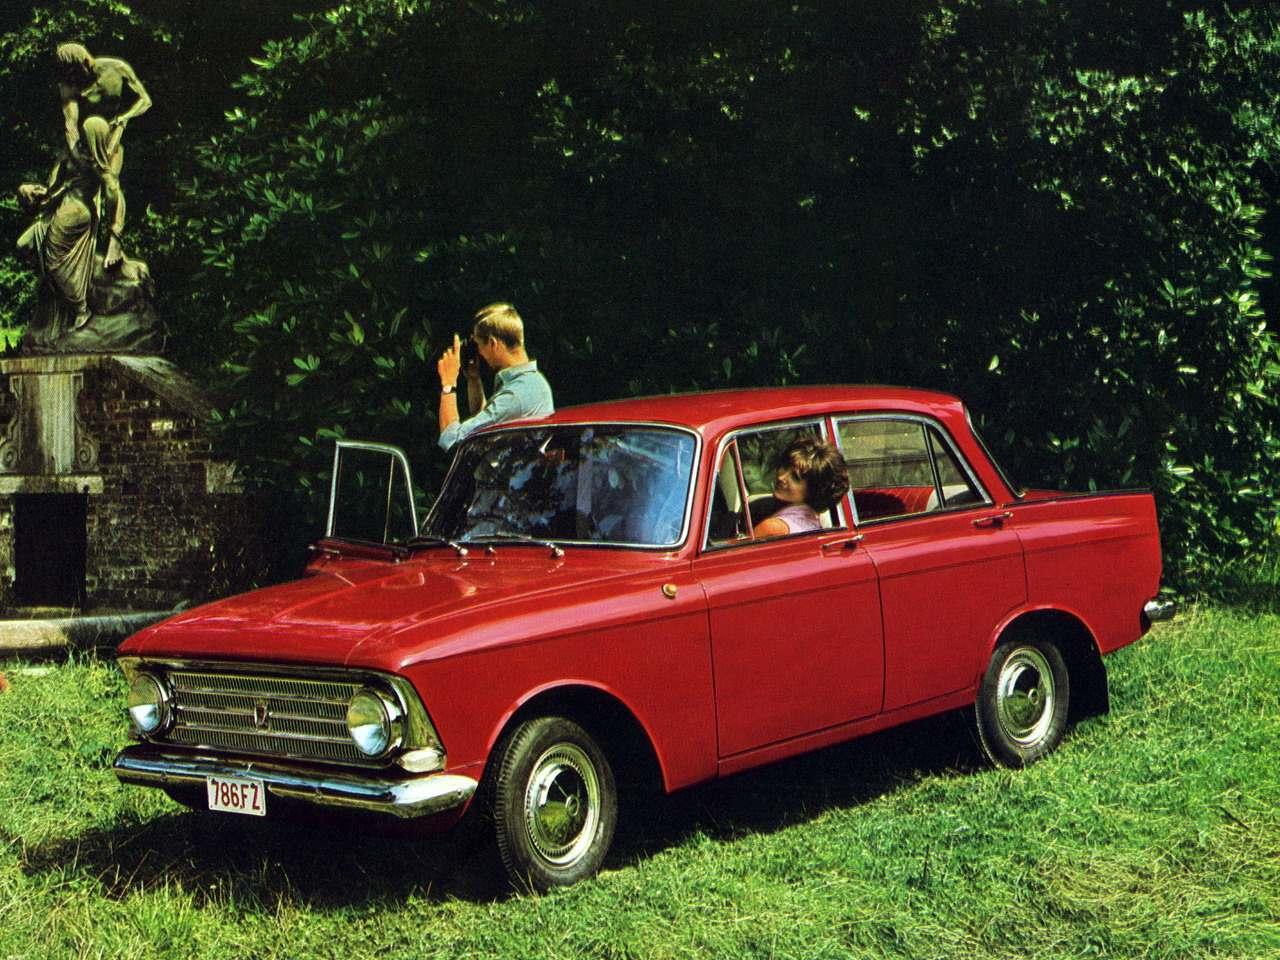 1966-1968. Izh-408 Moskvich (Москвич-408)